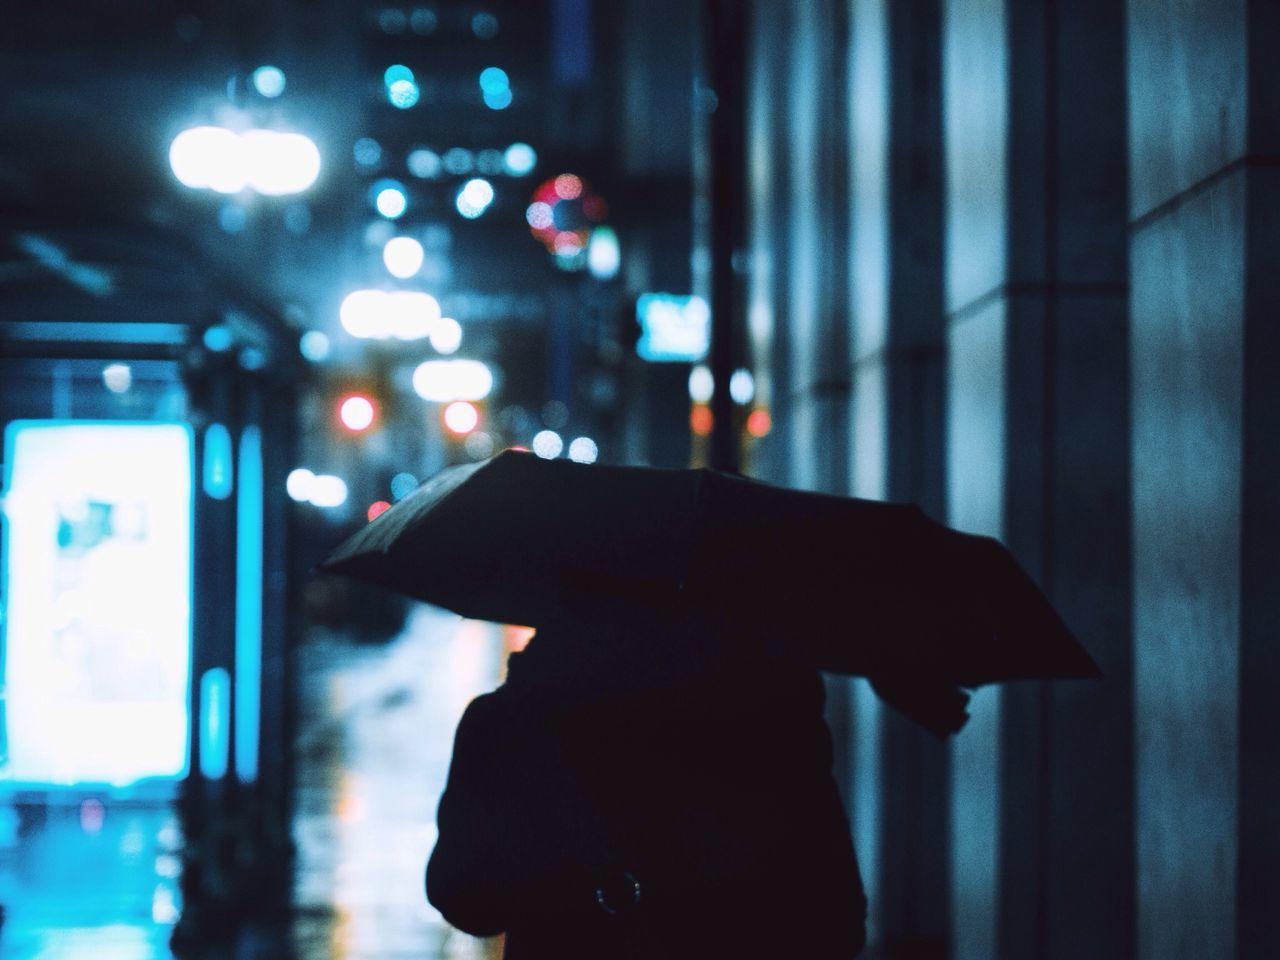 Architecture Chicago Rain EyeEm Best Shots Umbrella Colors Silhouette